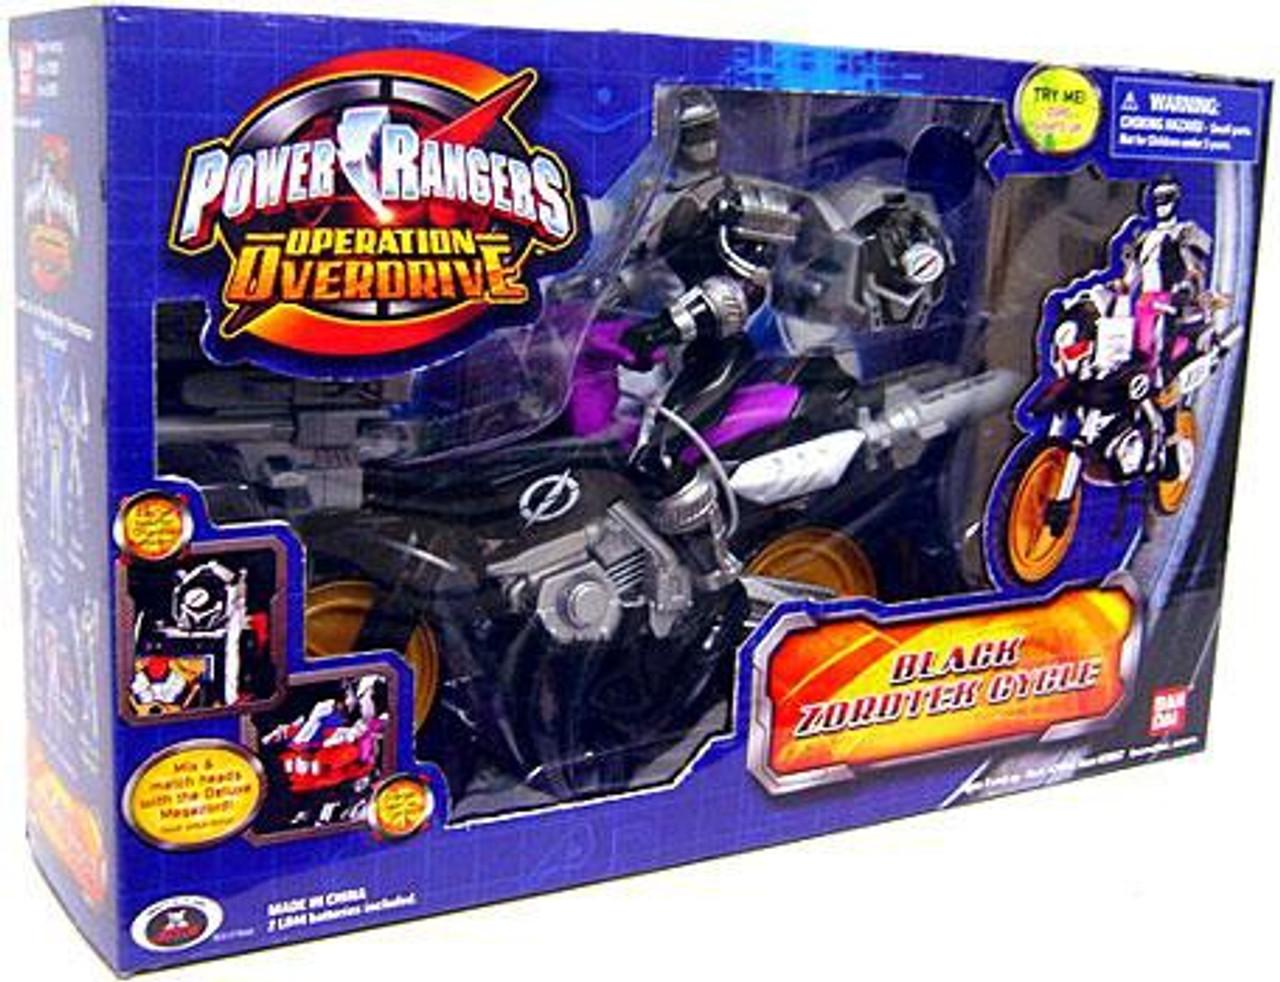 Power Rangers Operation Overdrive Black Zordtek Cycle Action Figure